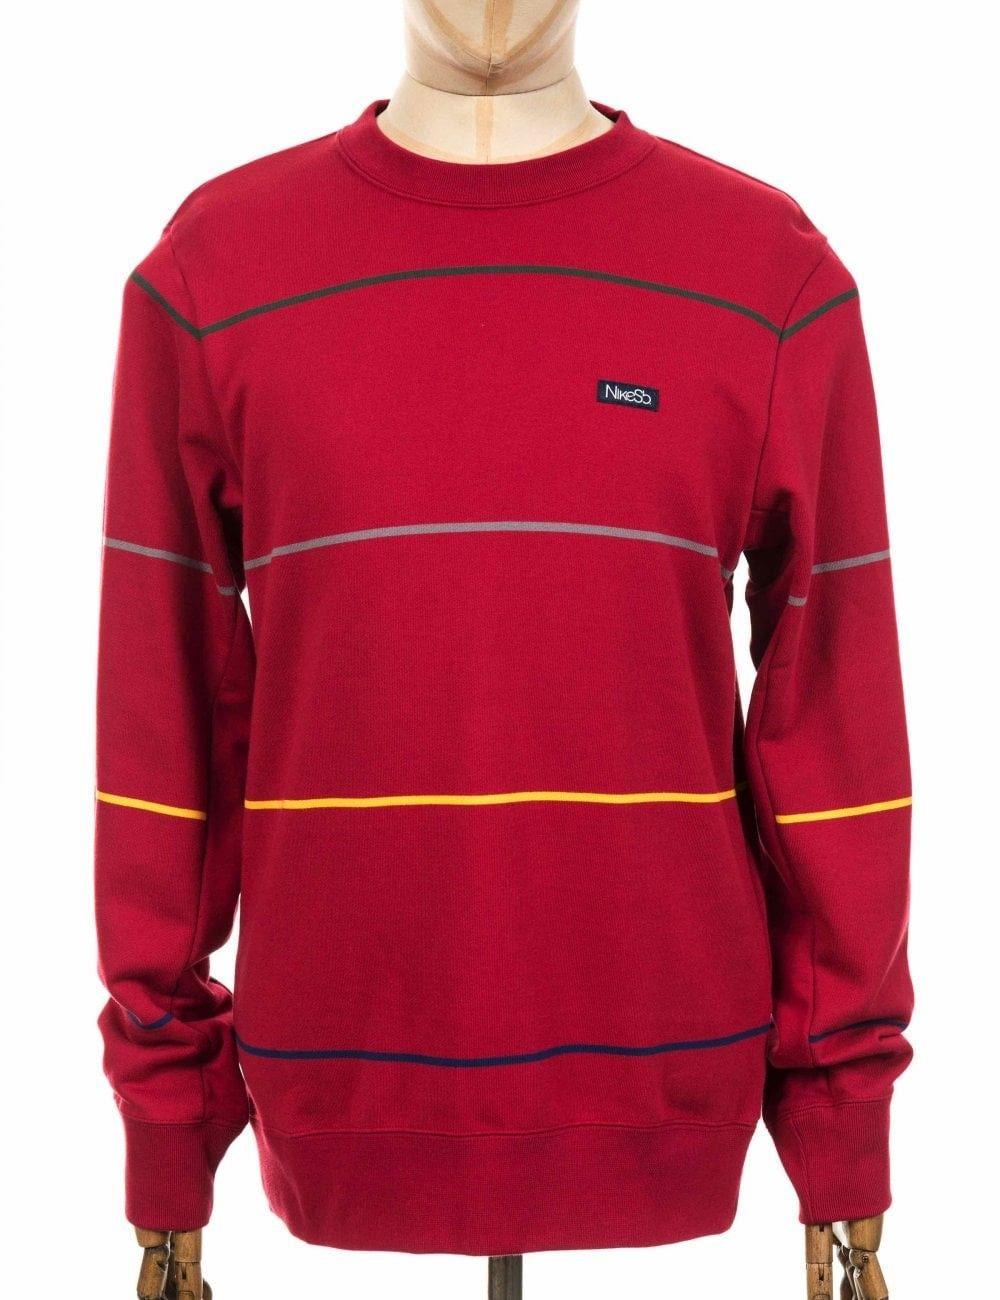 Nike Sb Everett Stripe Sweatshirt Red Crush Colour Red Crush Nike Cloth Striped Sweatshirts Sweatshirts Nike Sb [ 1300 x 1000 Pixel ]